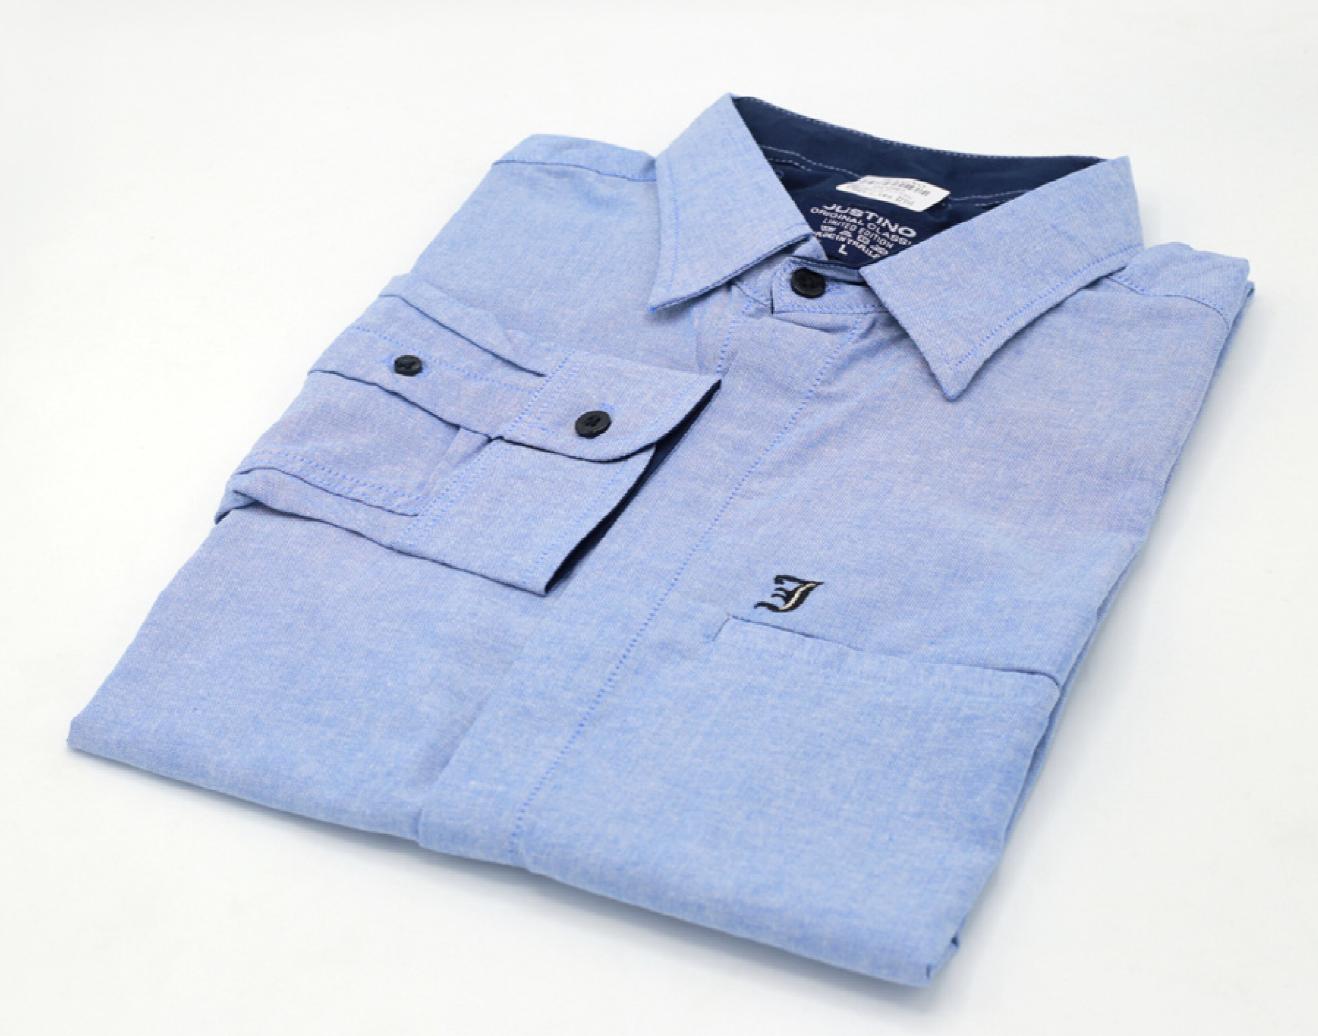 C02023 Shirt Justino